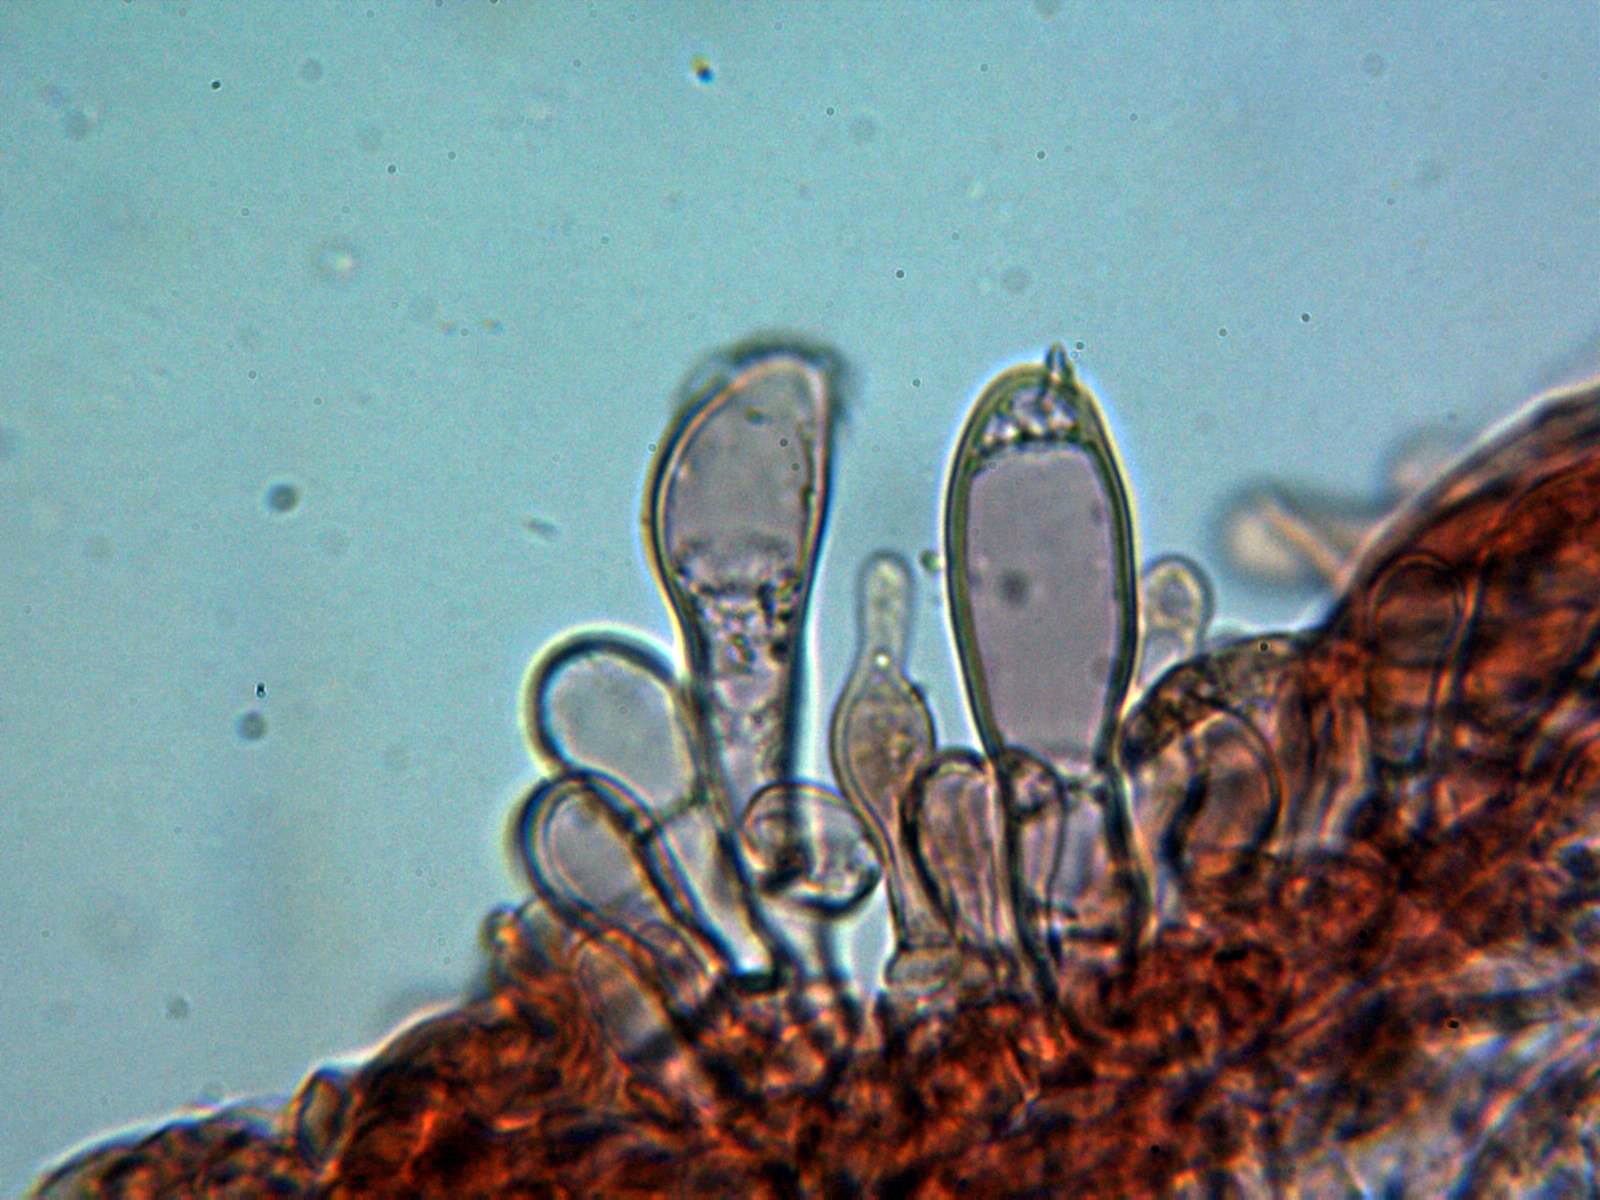 Caulocistidios3_2020-09-24-2.jpg